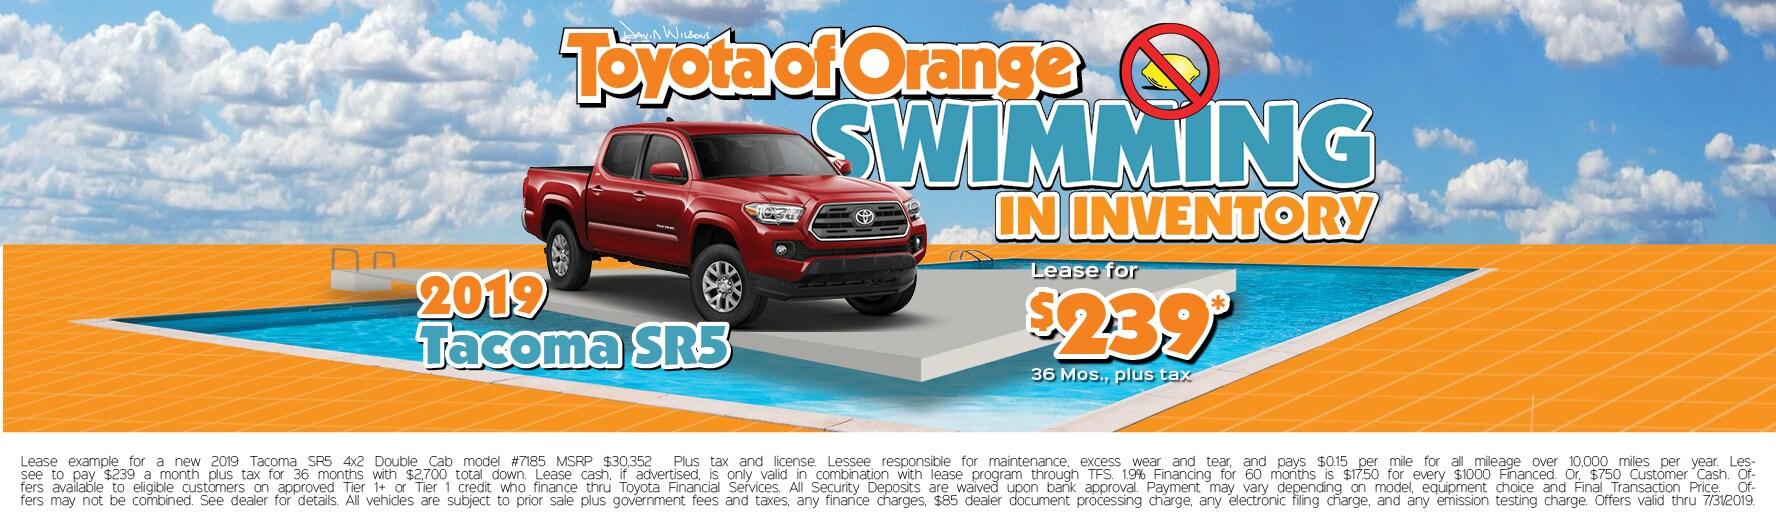 Toyota Of Orange >> Toyota Of Orange Your Trusted Toyota Dealers In Orange County Ca